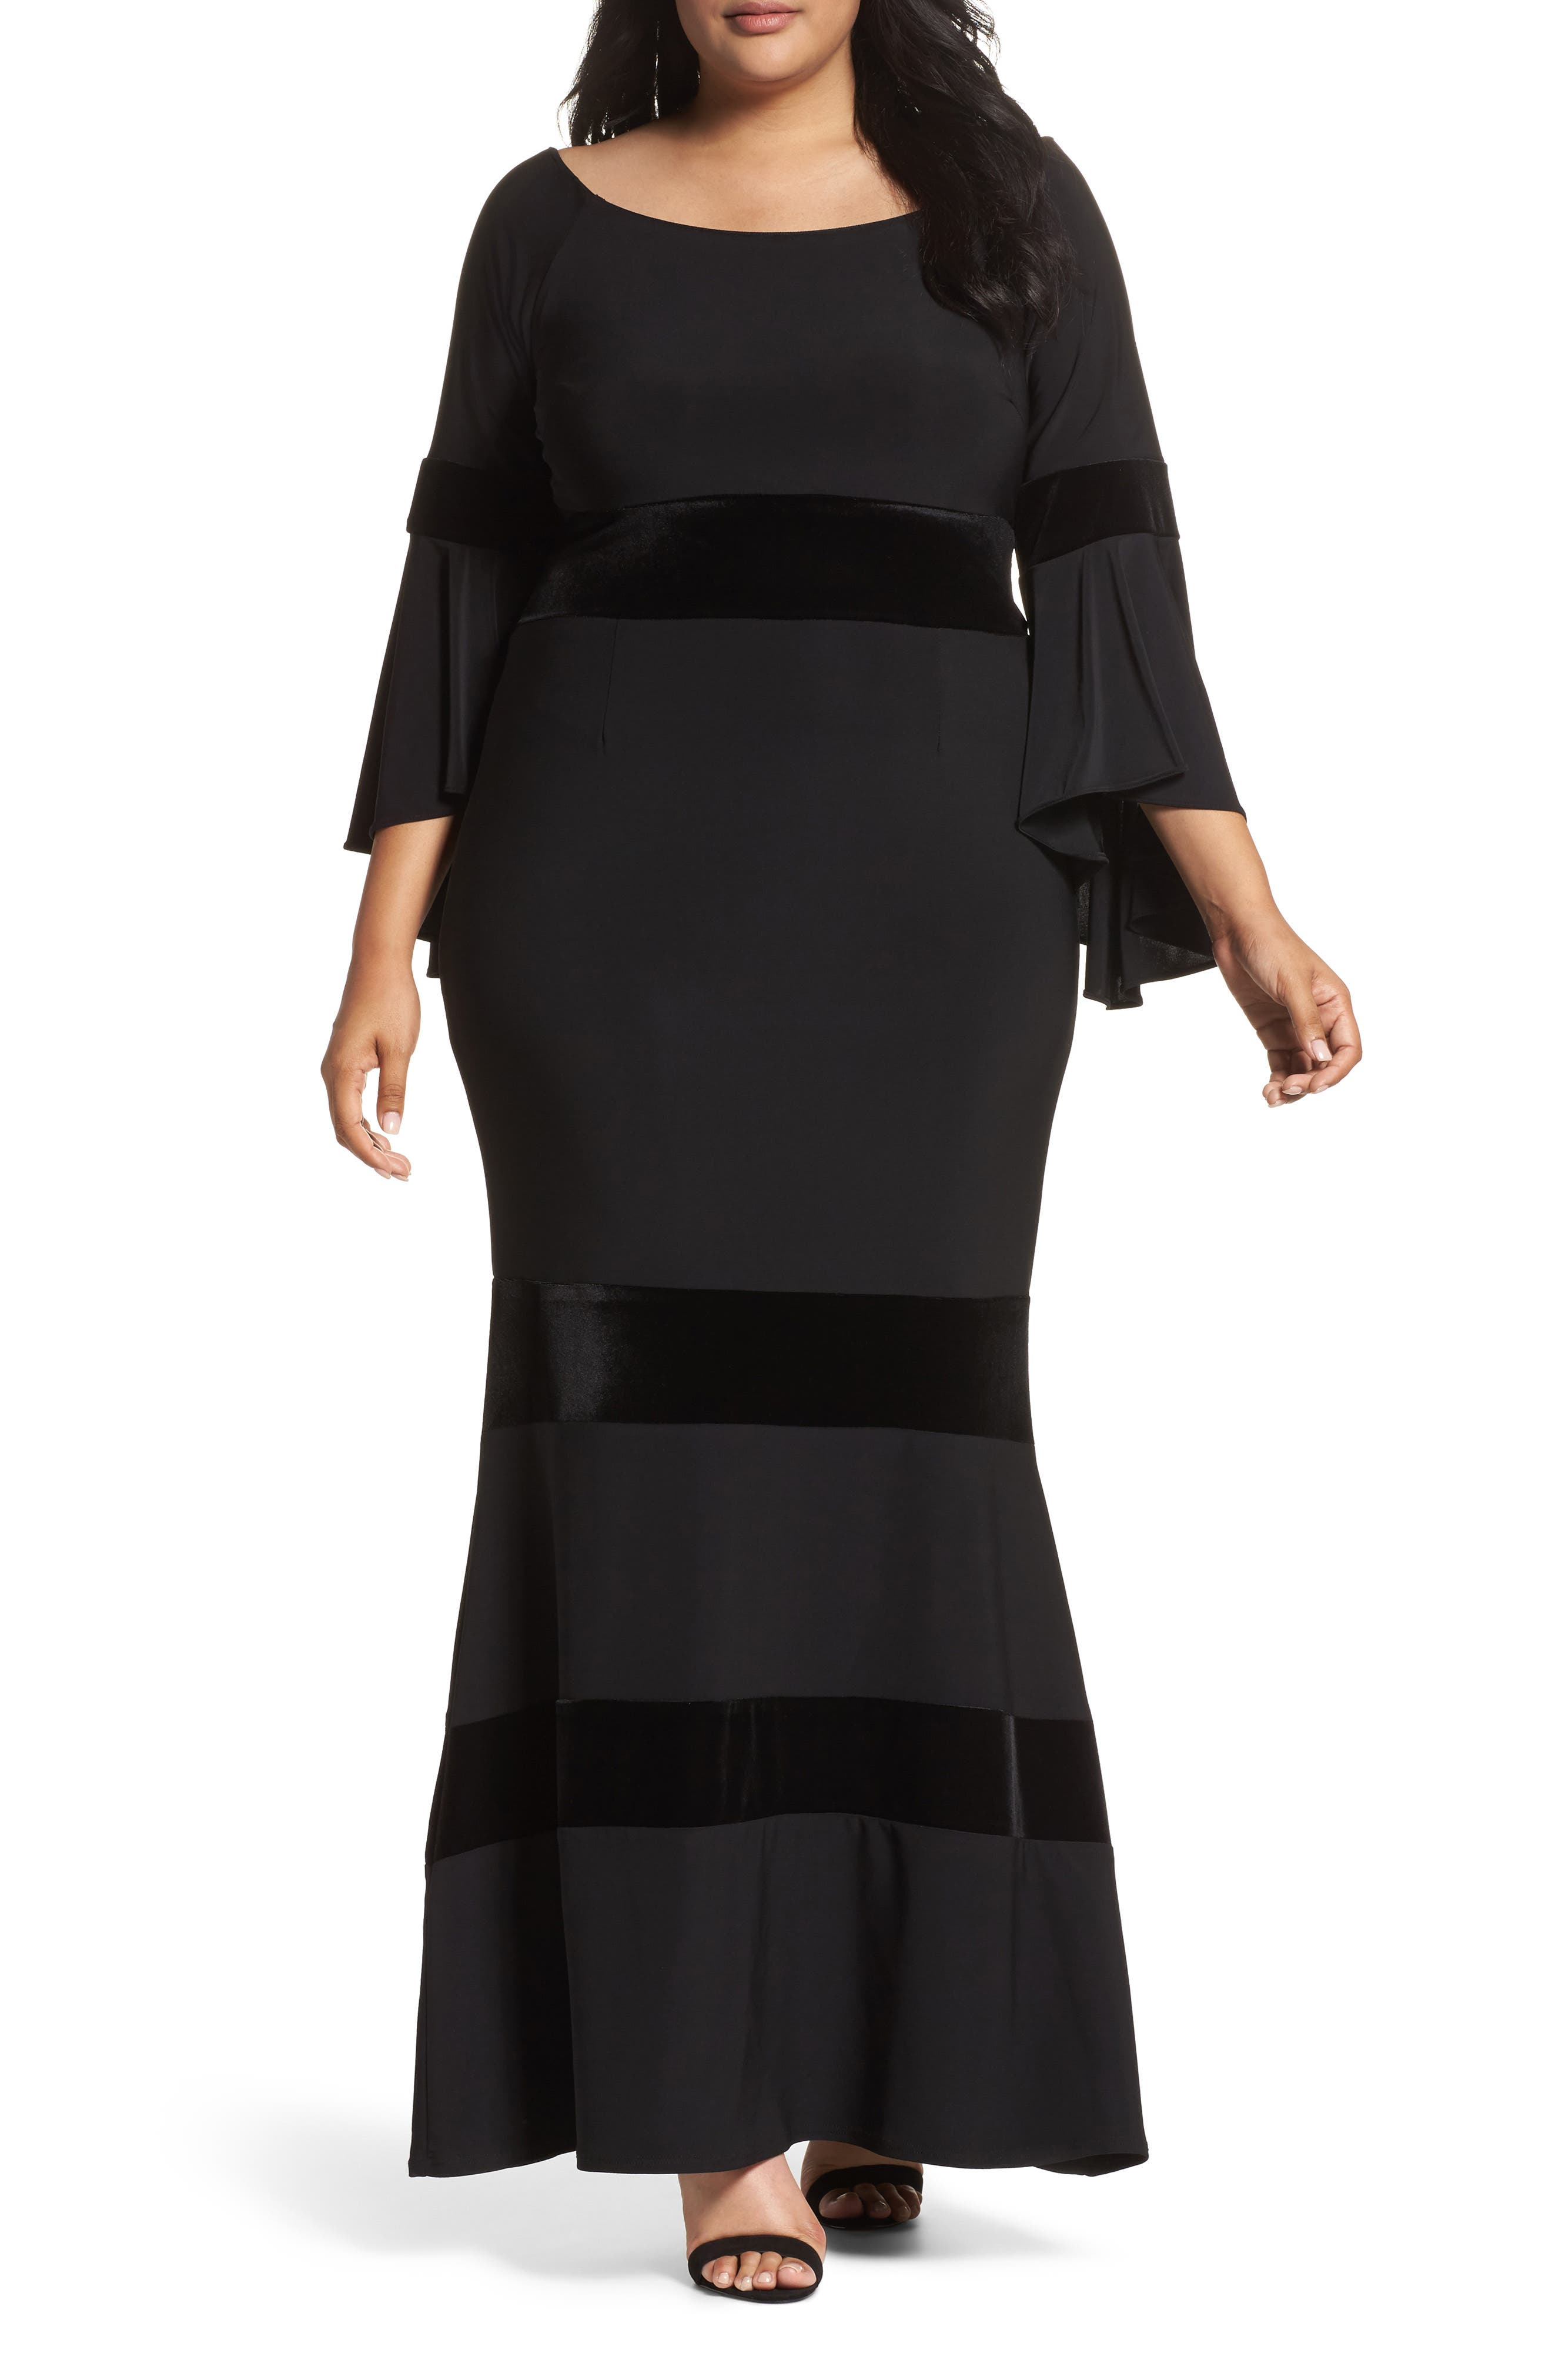 Alternate Image 1 Selected - Xscape Velvet Trim Maxi Dress (Plus Size)